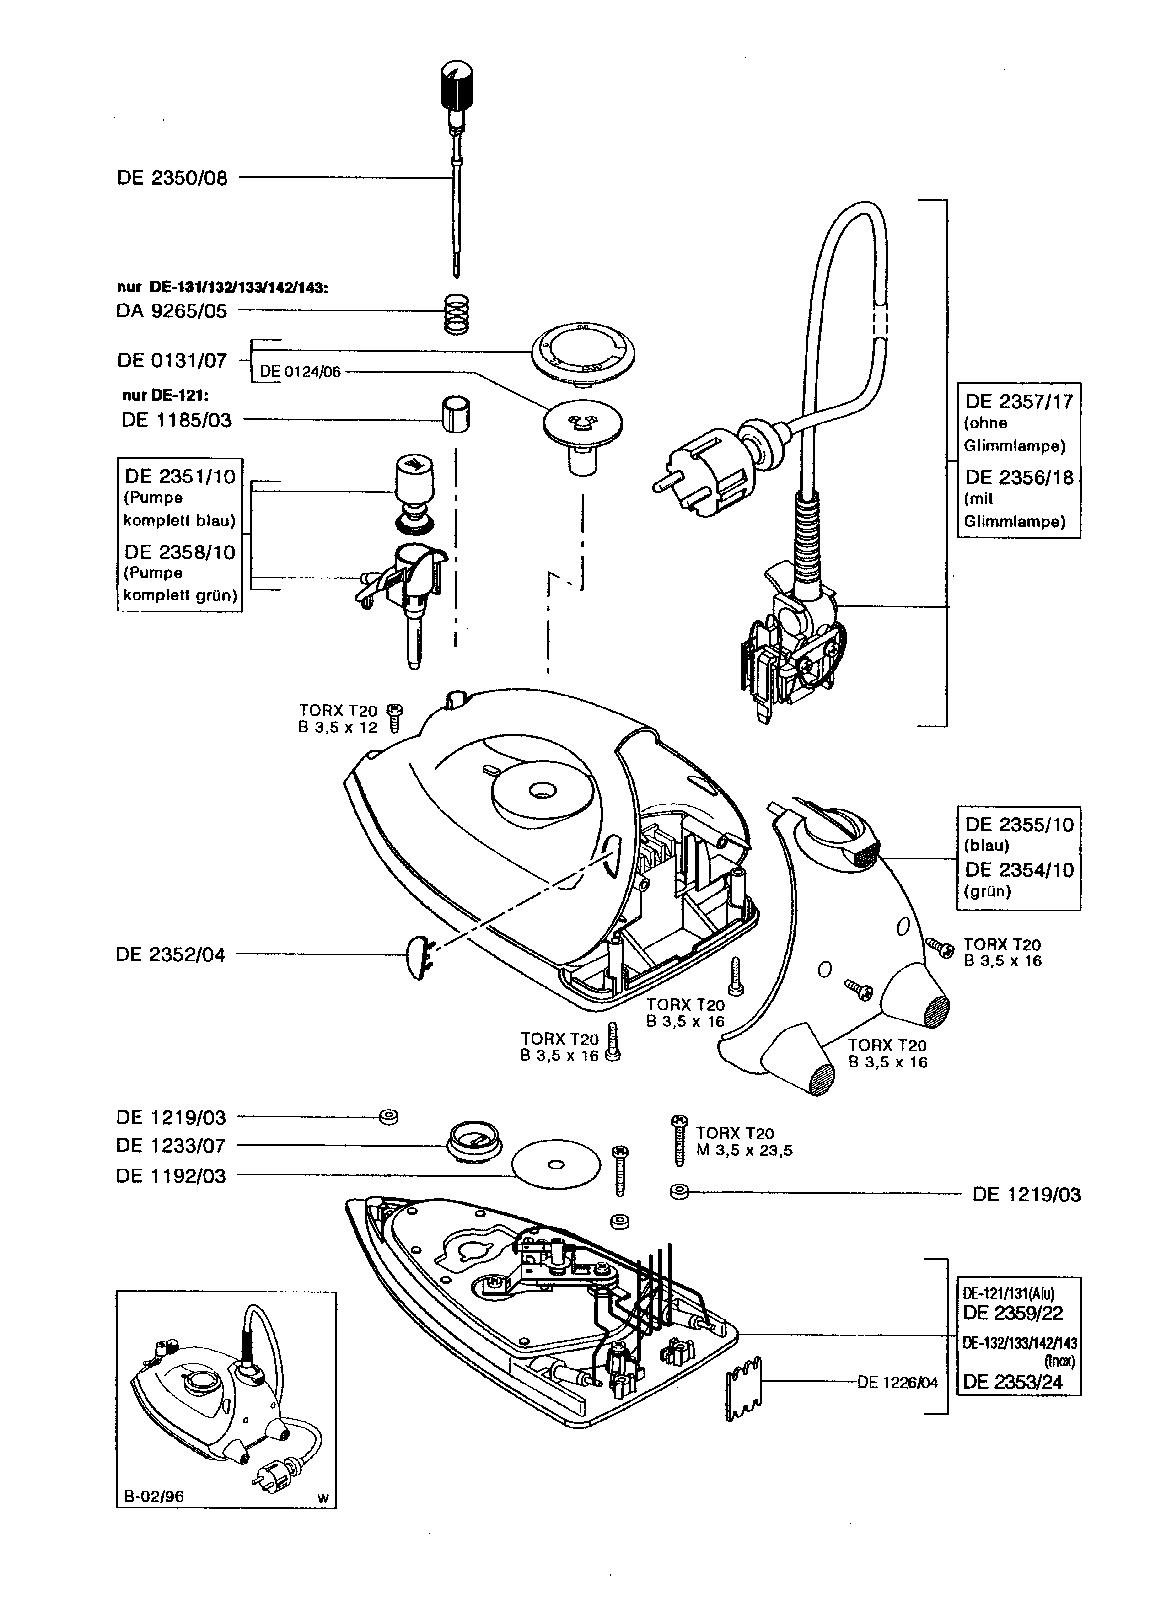 Rowenta Iron Spare Parts